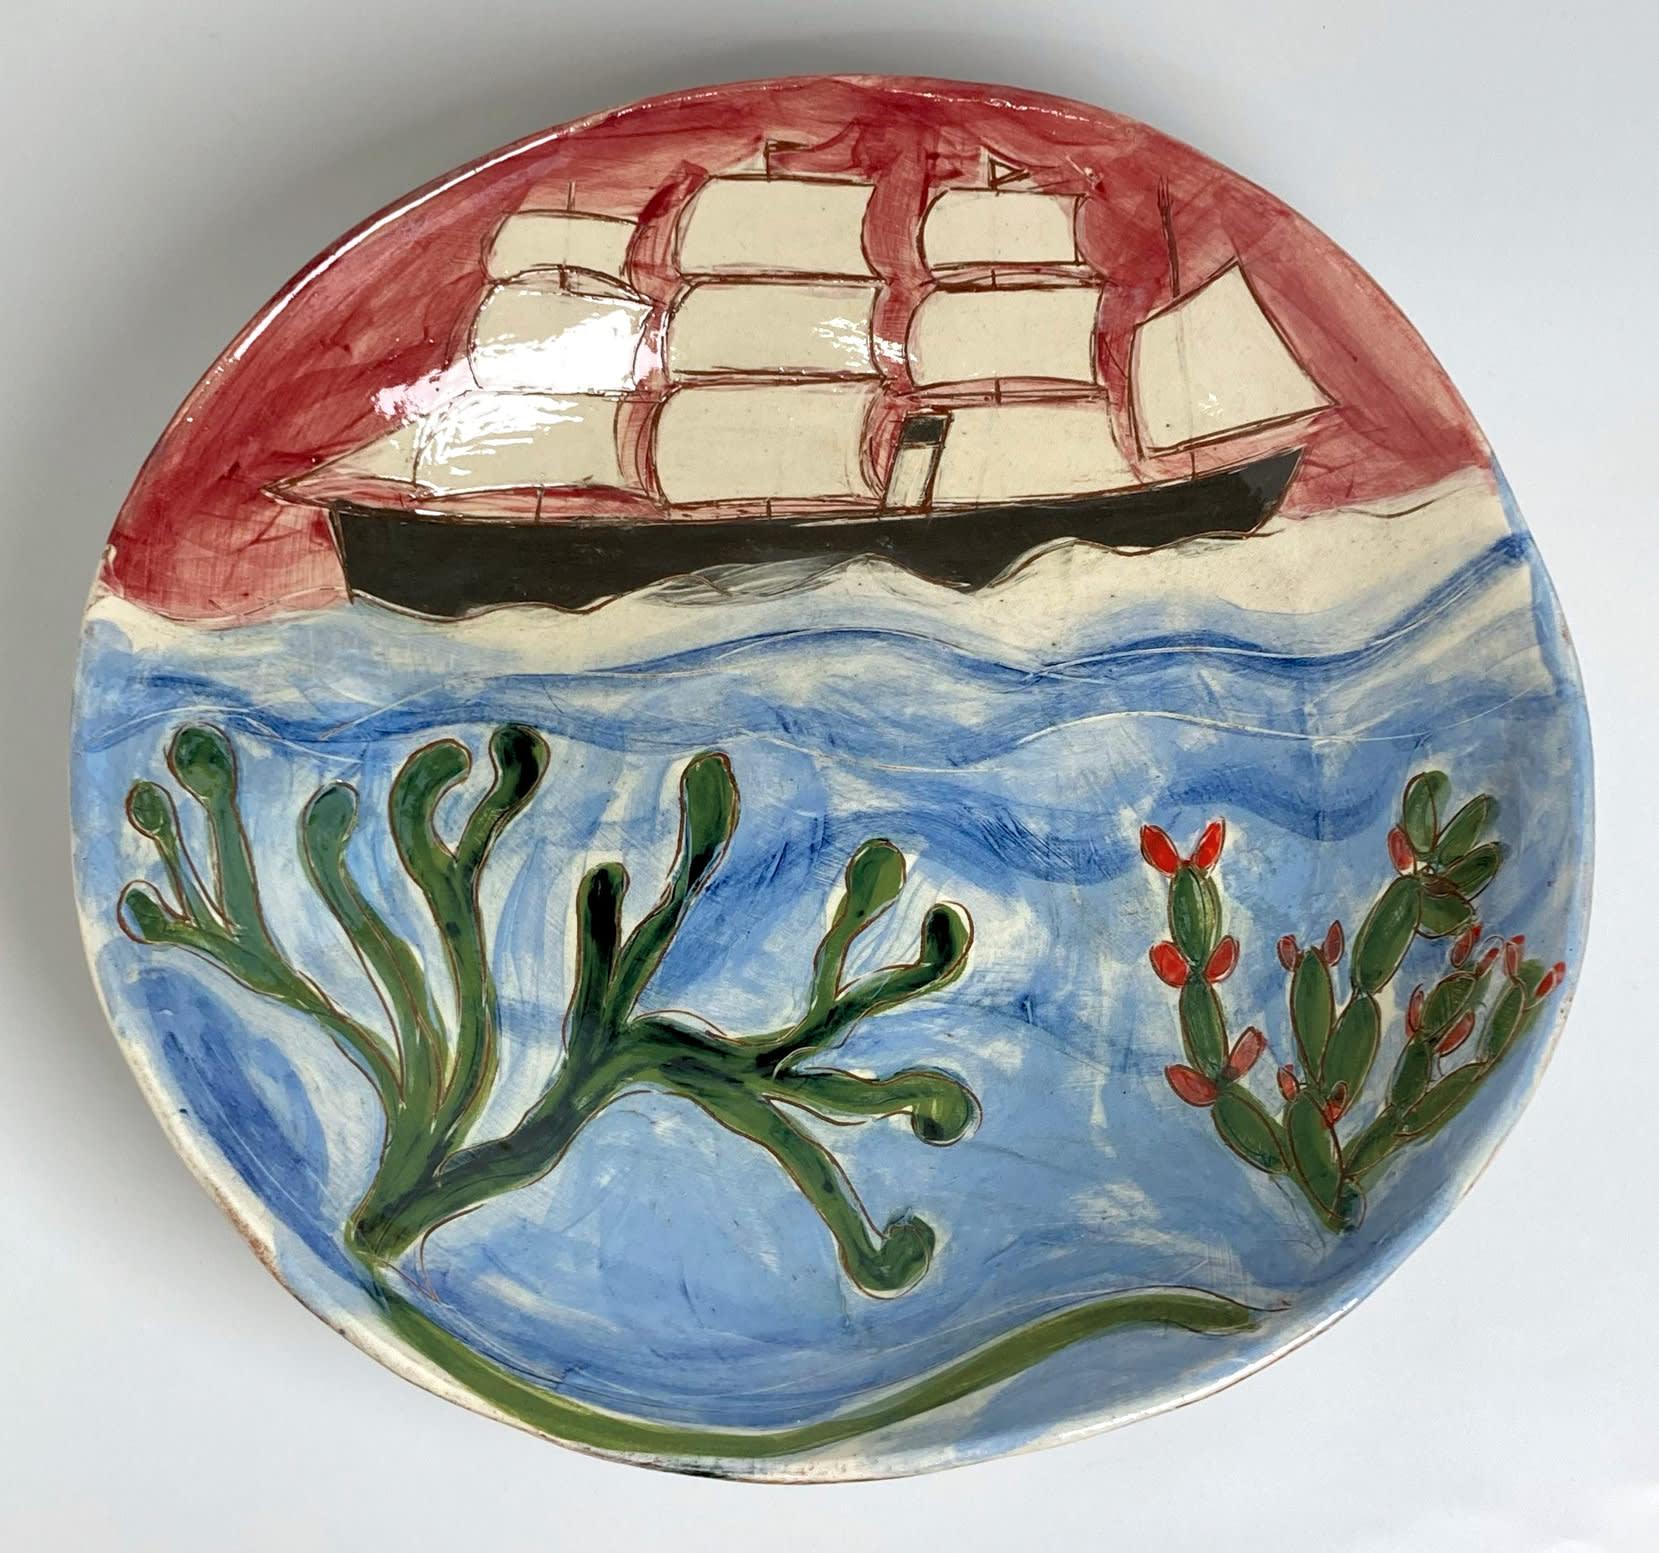 "<span class=""link fancybox-details-link""><a href=""/artists/428-anne-barrell/works/7694-anne-barrell-oceanic-2021/"">View Detail Page</a></span><div class=""artist""><strong>Anne Barrell</strong></div> <div class=""title""><em>Oceanic</em>, 2021</div> <div class=""medium"">handmade, hand-painted ceramic </div> <div class=""dimensions"">h. 33 x w. 32 cm </div><div class=""copyright_line"">Own Art: £29 x 10 Months, 0% APR</div>"